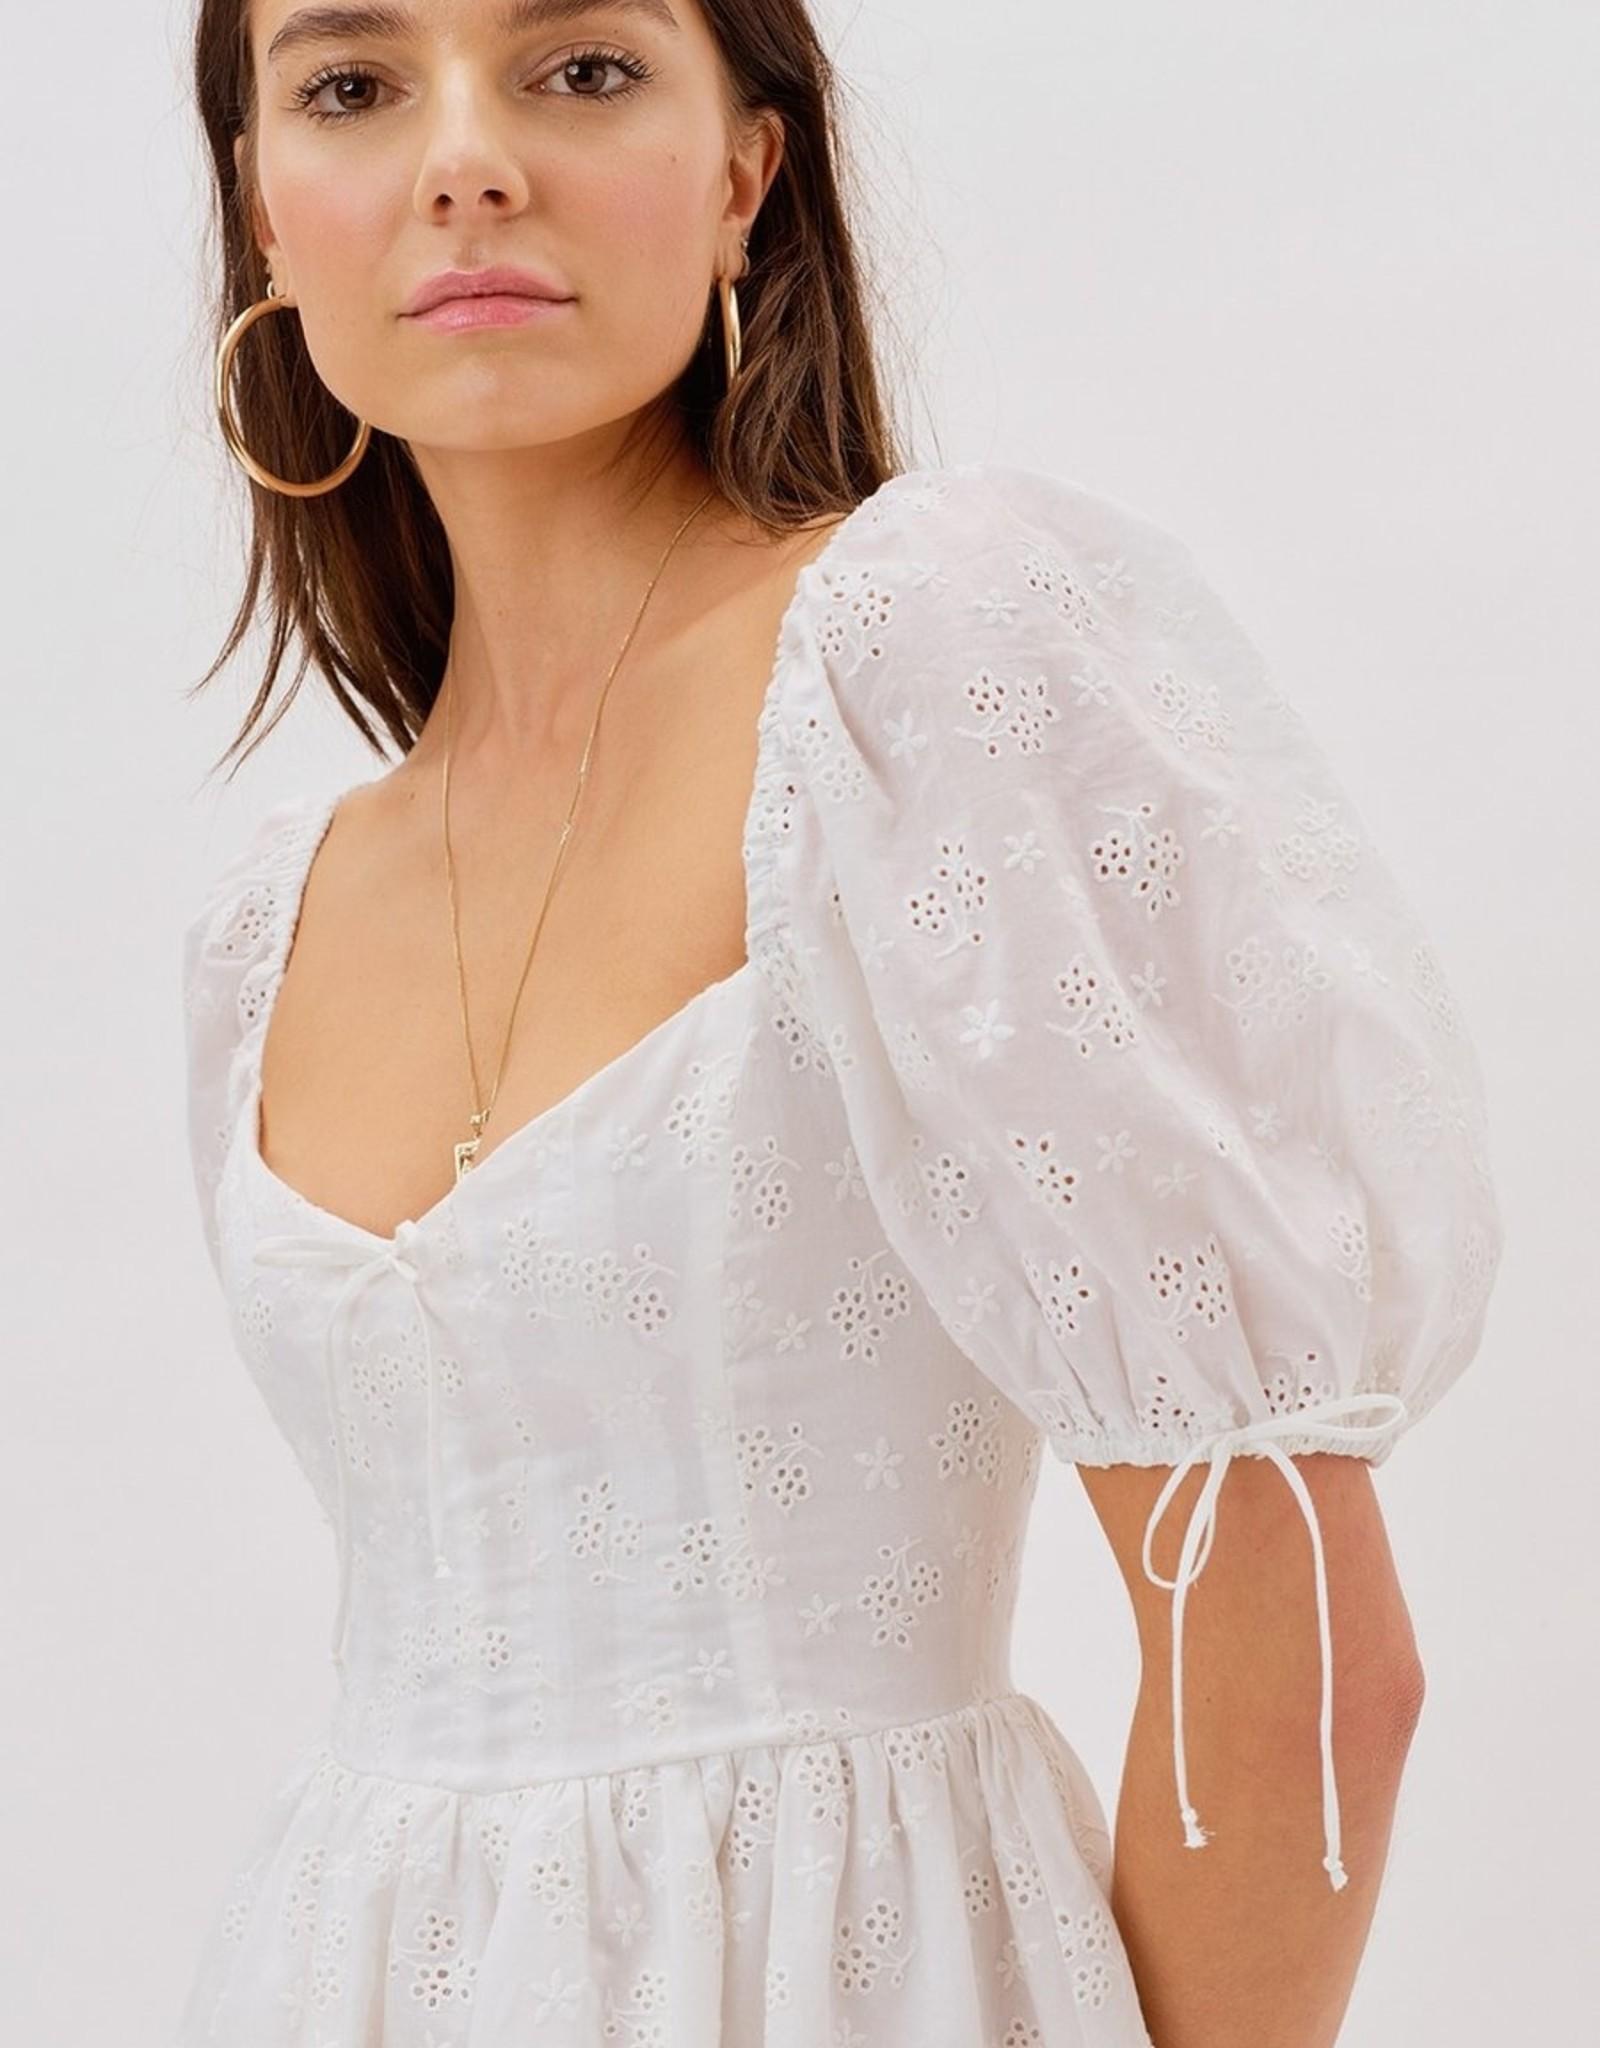 For Love and Lemon CD2391-SU21 Jean Mini Dress